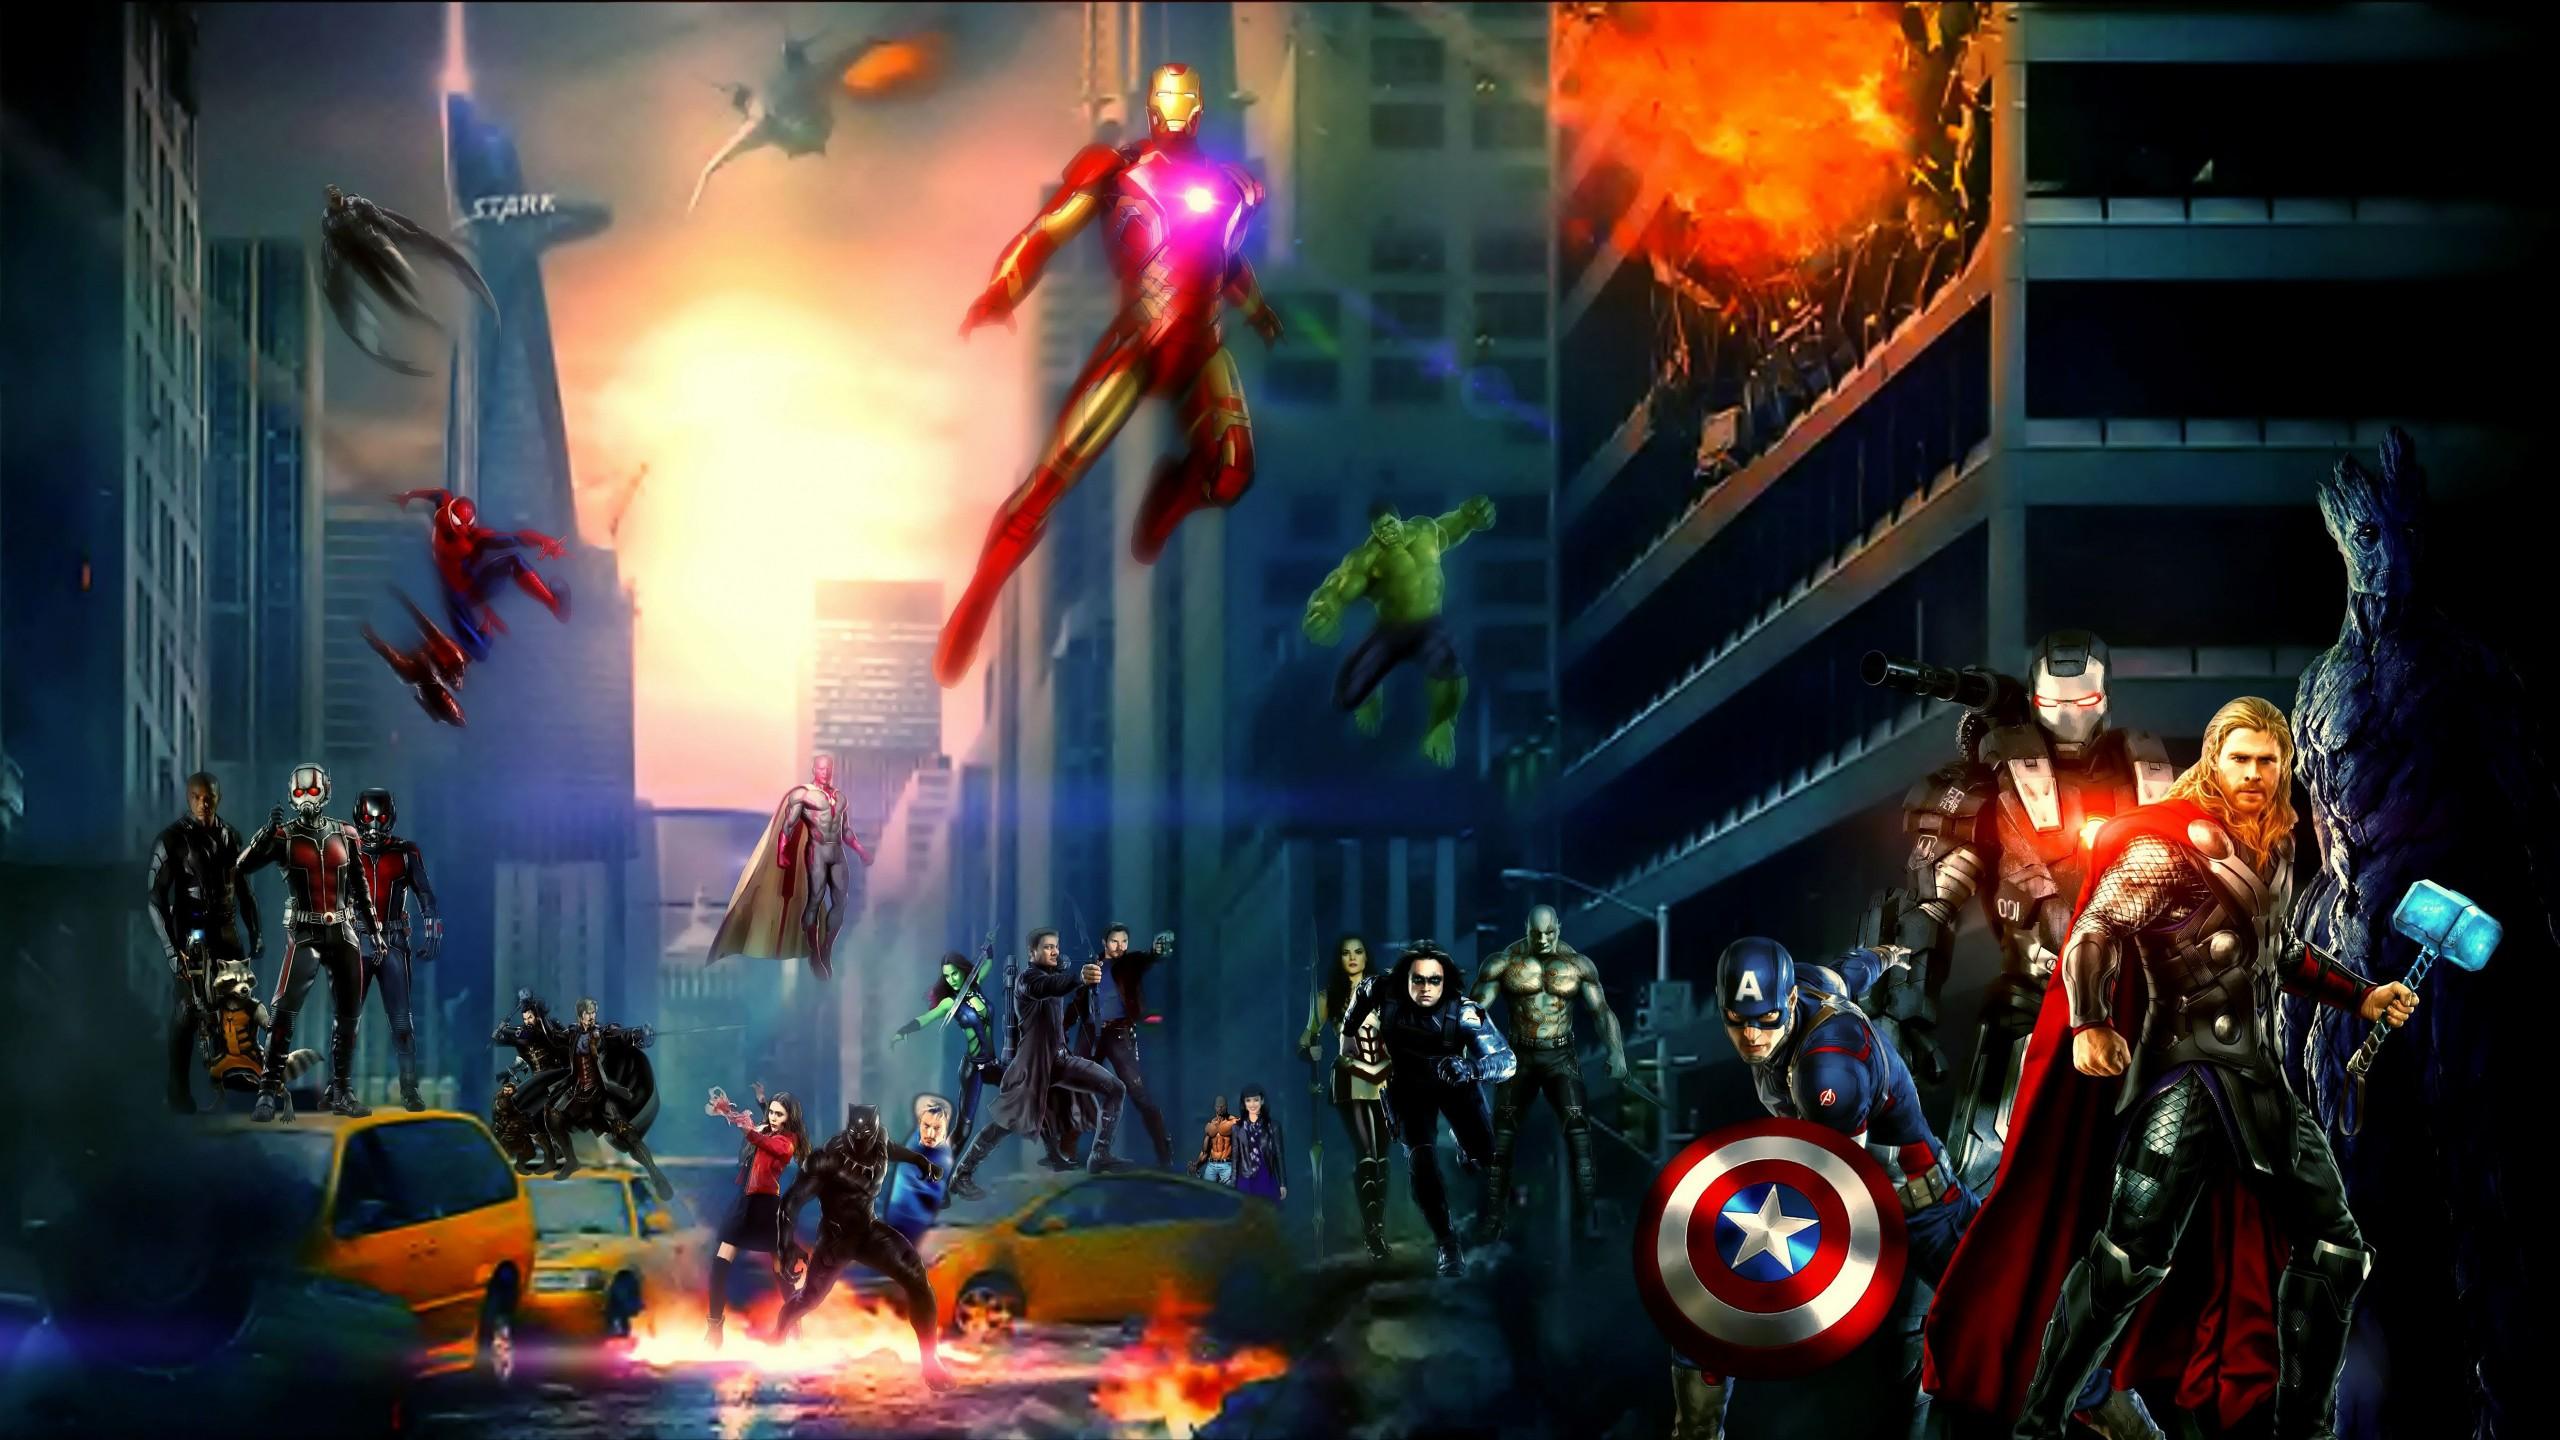 Cute Minimalist Wallpaper Marvel Cinematic Universe 5k Wallpapers Hd Wallpapers